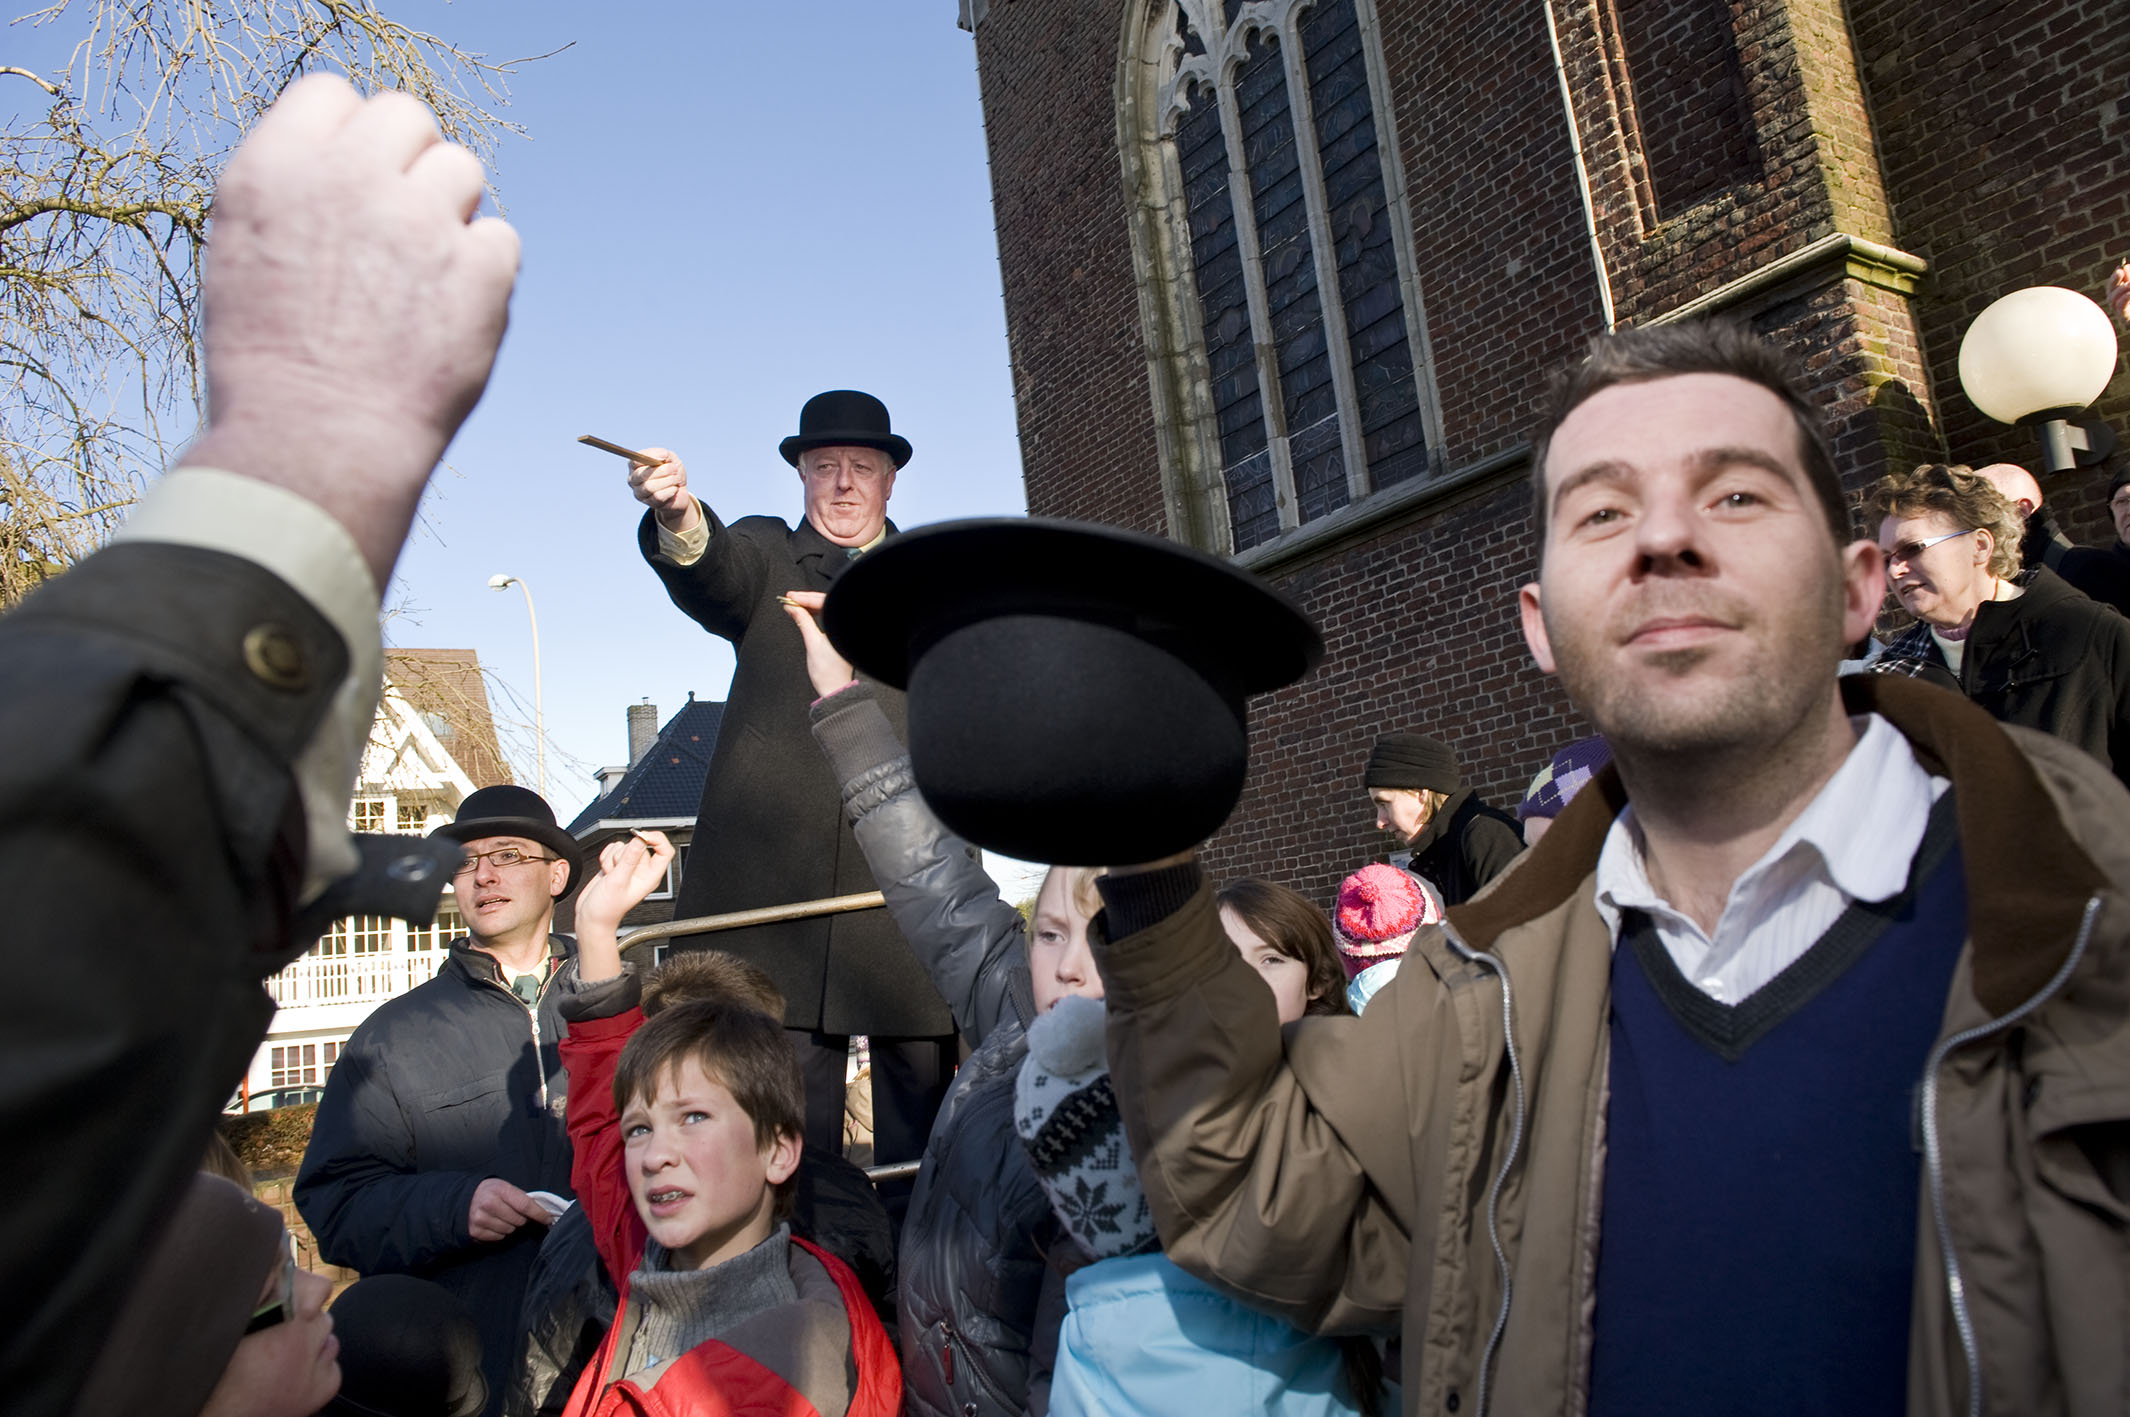 Ingooigem, Belgium, January 17, 2010 Sint-Antoniusviering in Ingooigem, deelgemeente van Anzegem. ©Nick Hannes